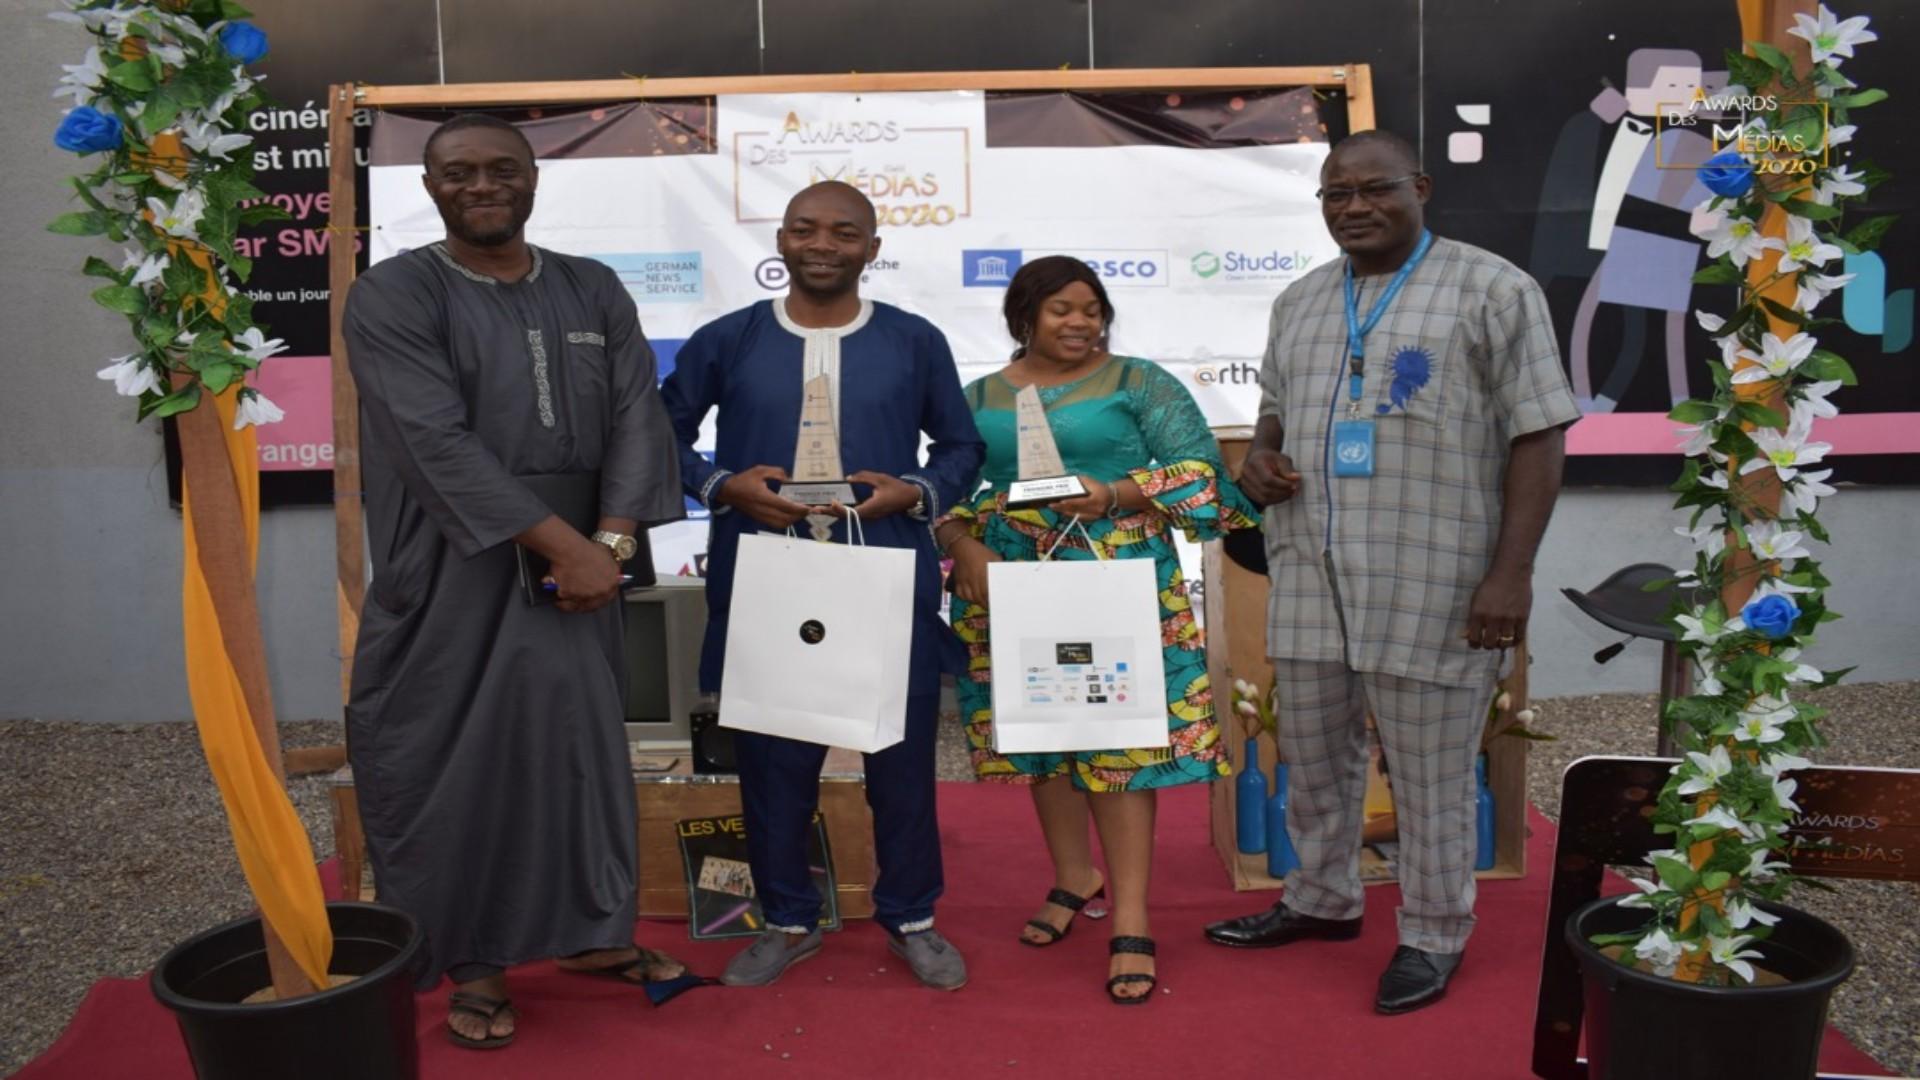 Migrations Média Awards 2021: Charles Biyoo Ella sacré vainqueur